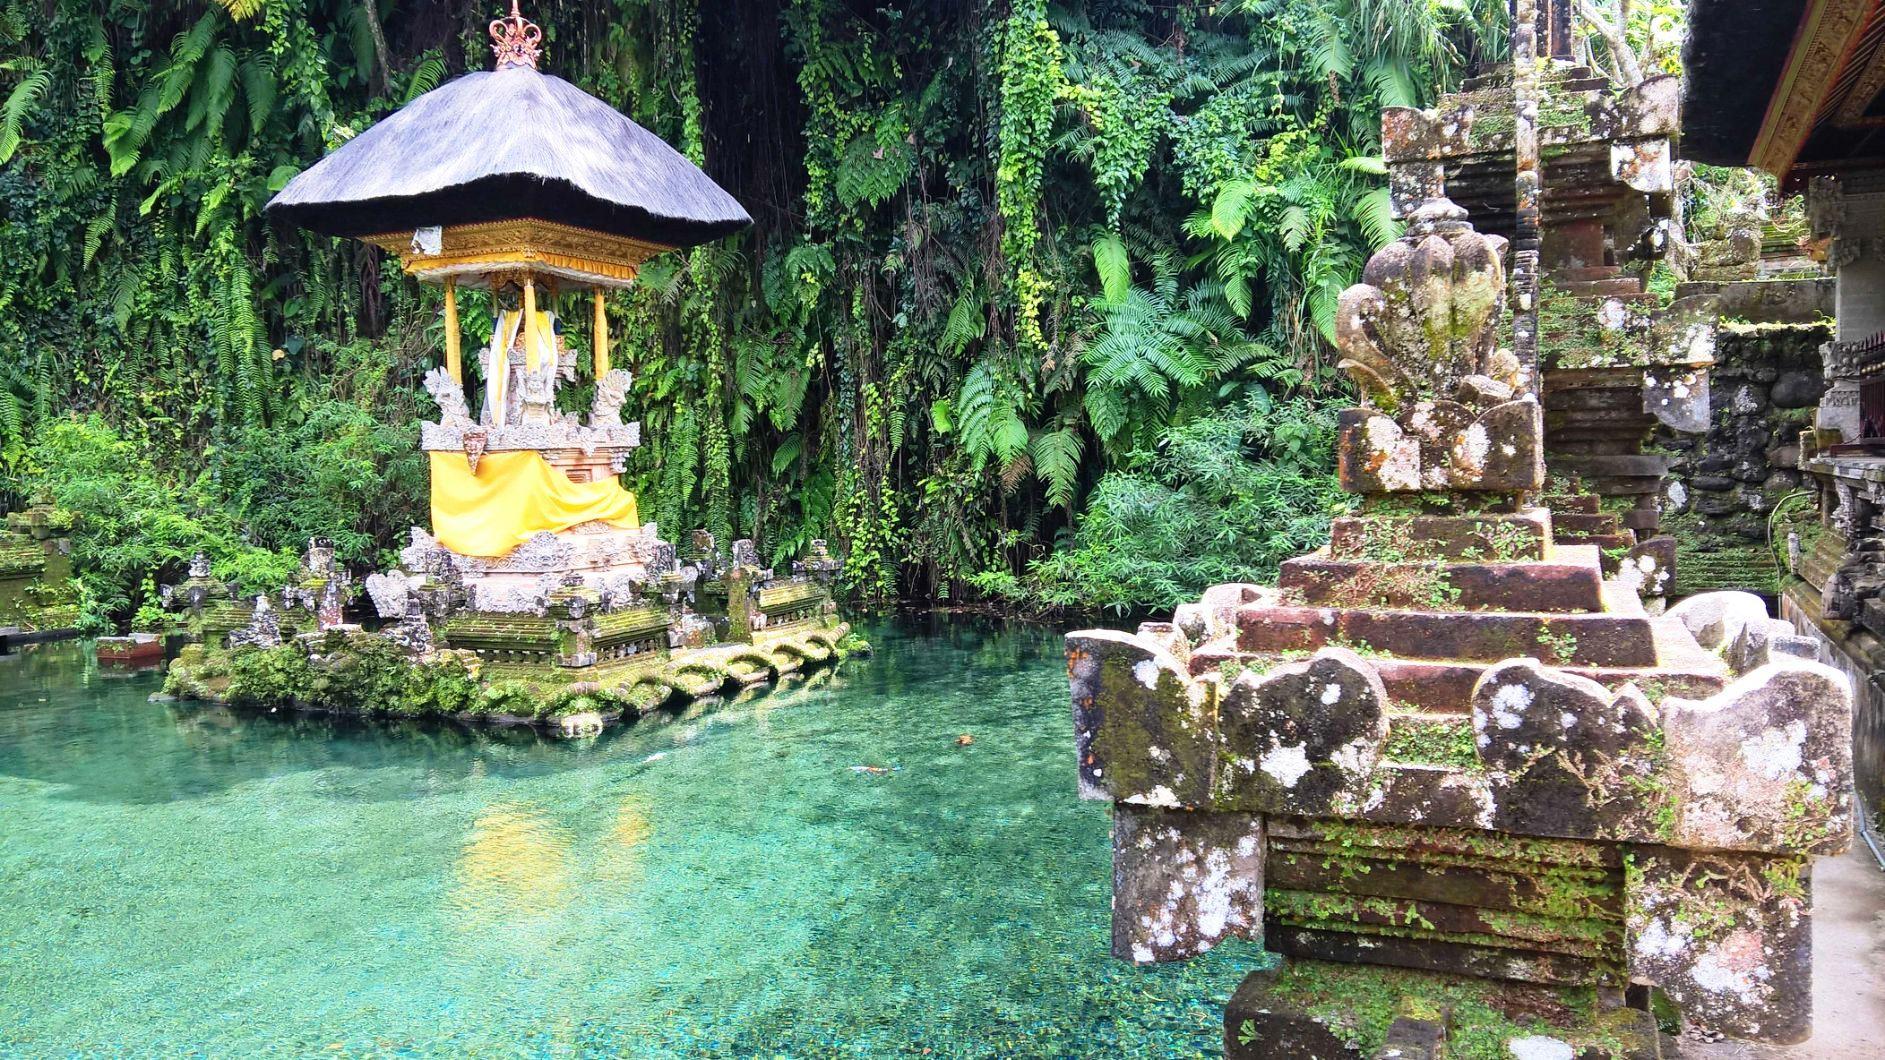 Bali Sebatu temple la vasca